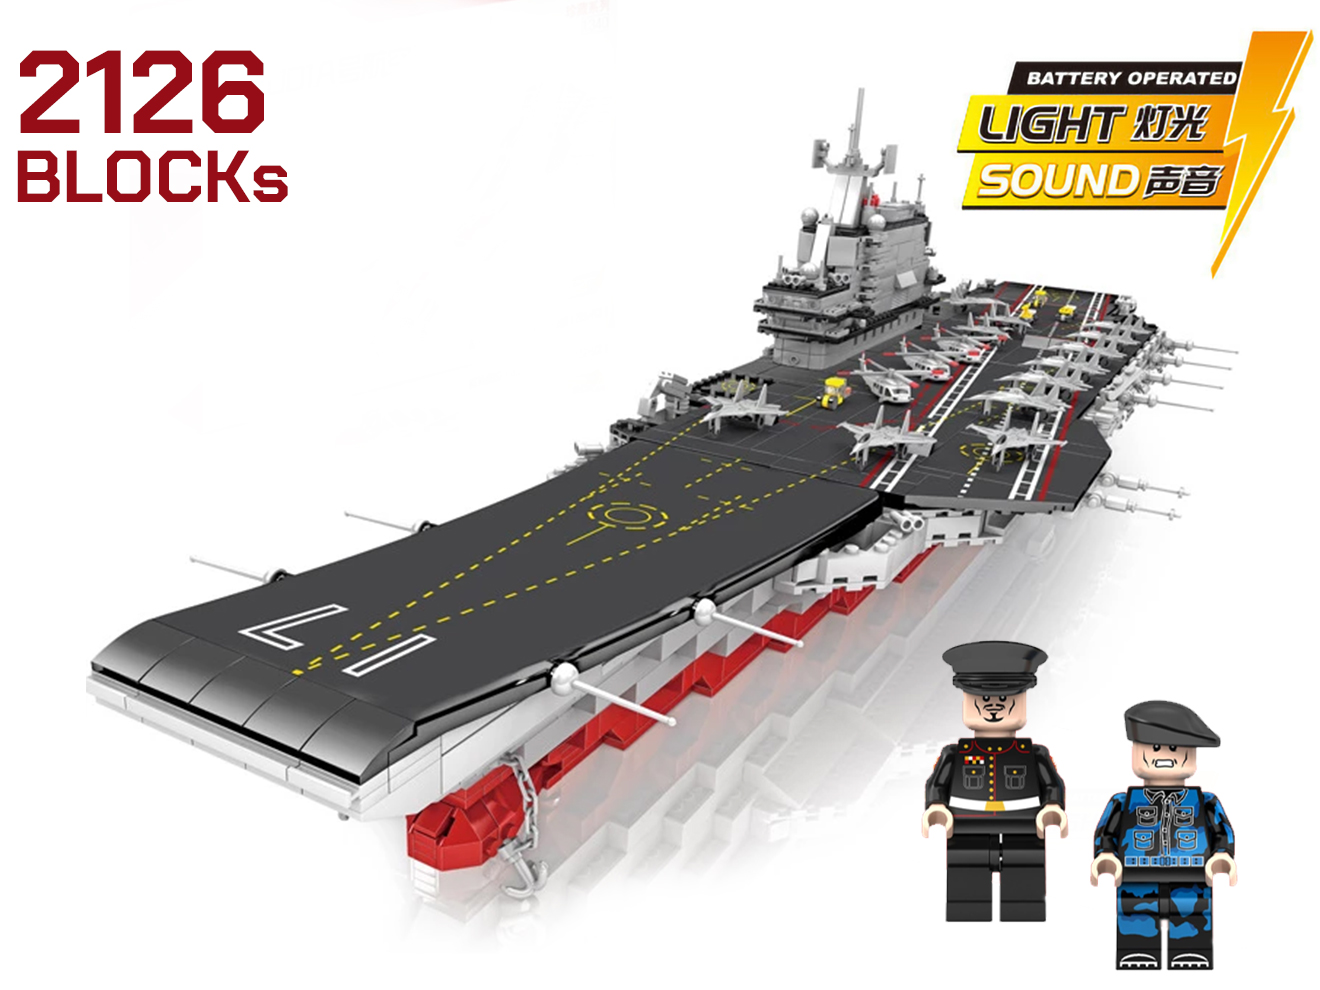 AFM 001A型航空母艦 2126Blocks ライブサウンド/モジューラル/ライトオン◆組みごたえ抜群 1/340スケール模型ブロック ミリタリー グッズ